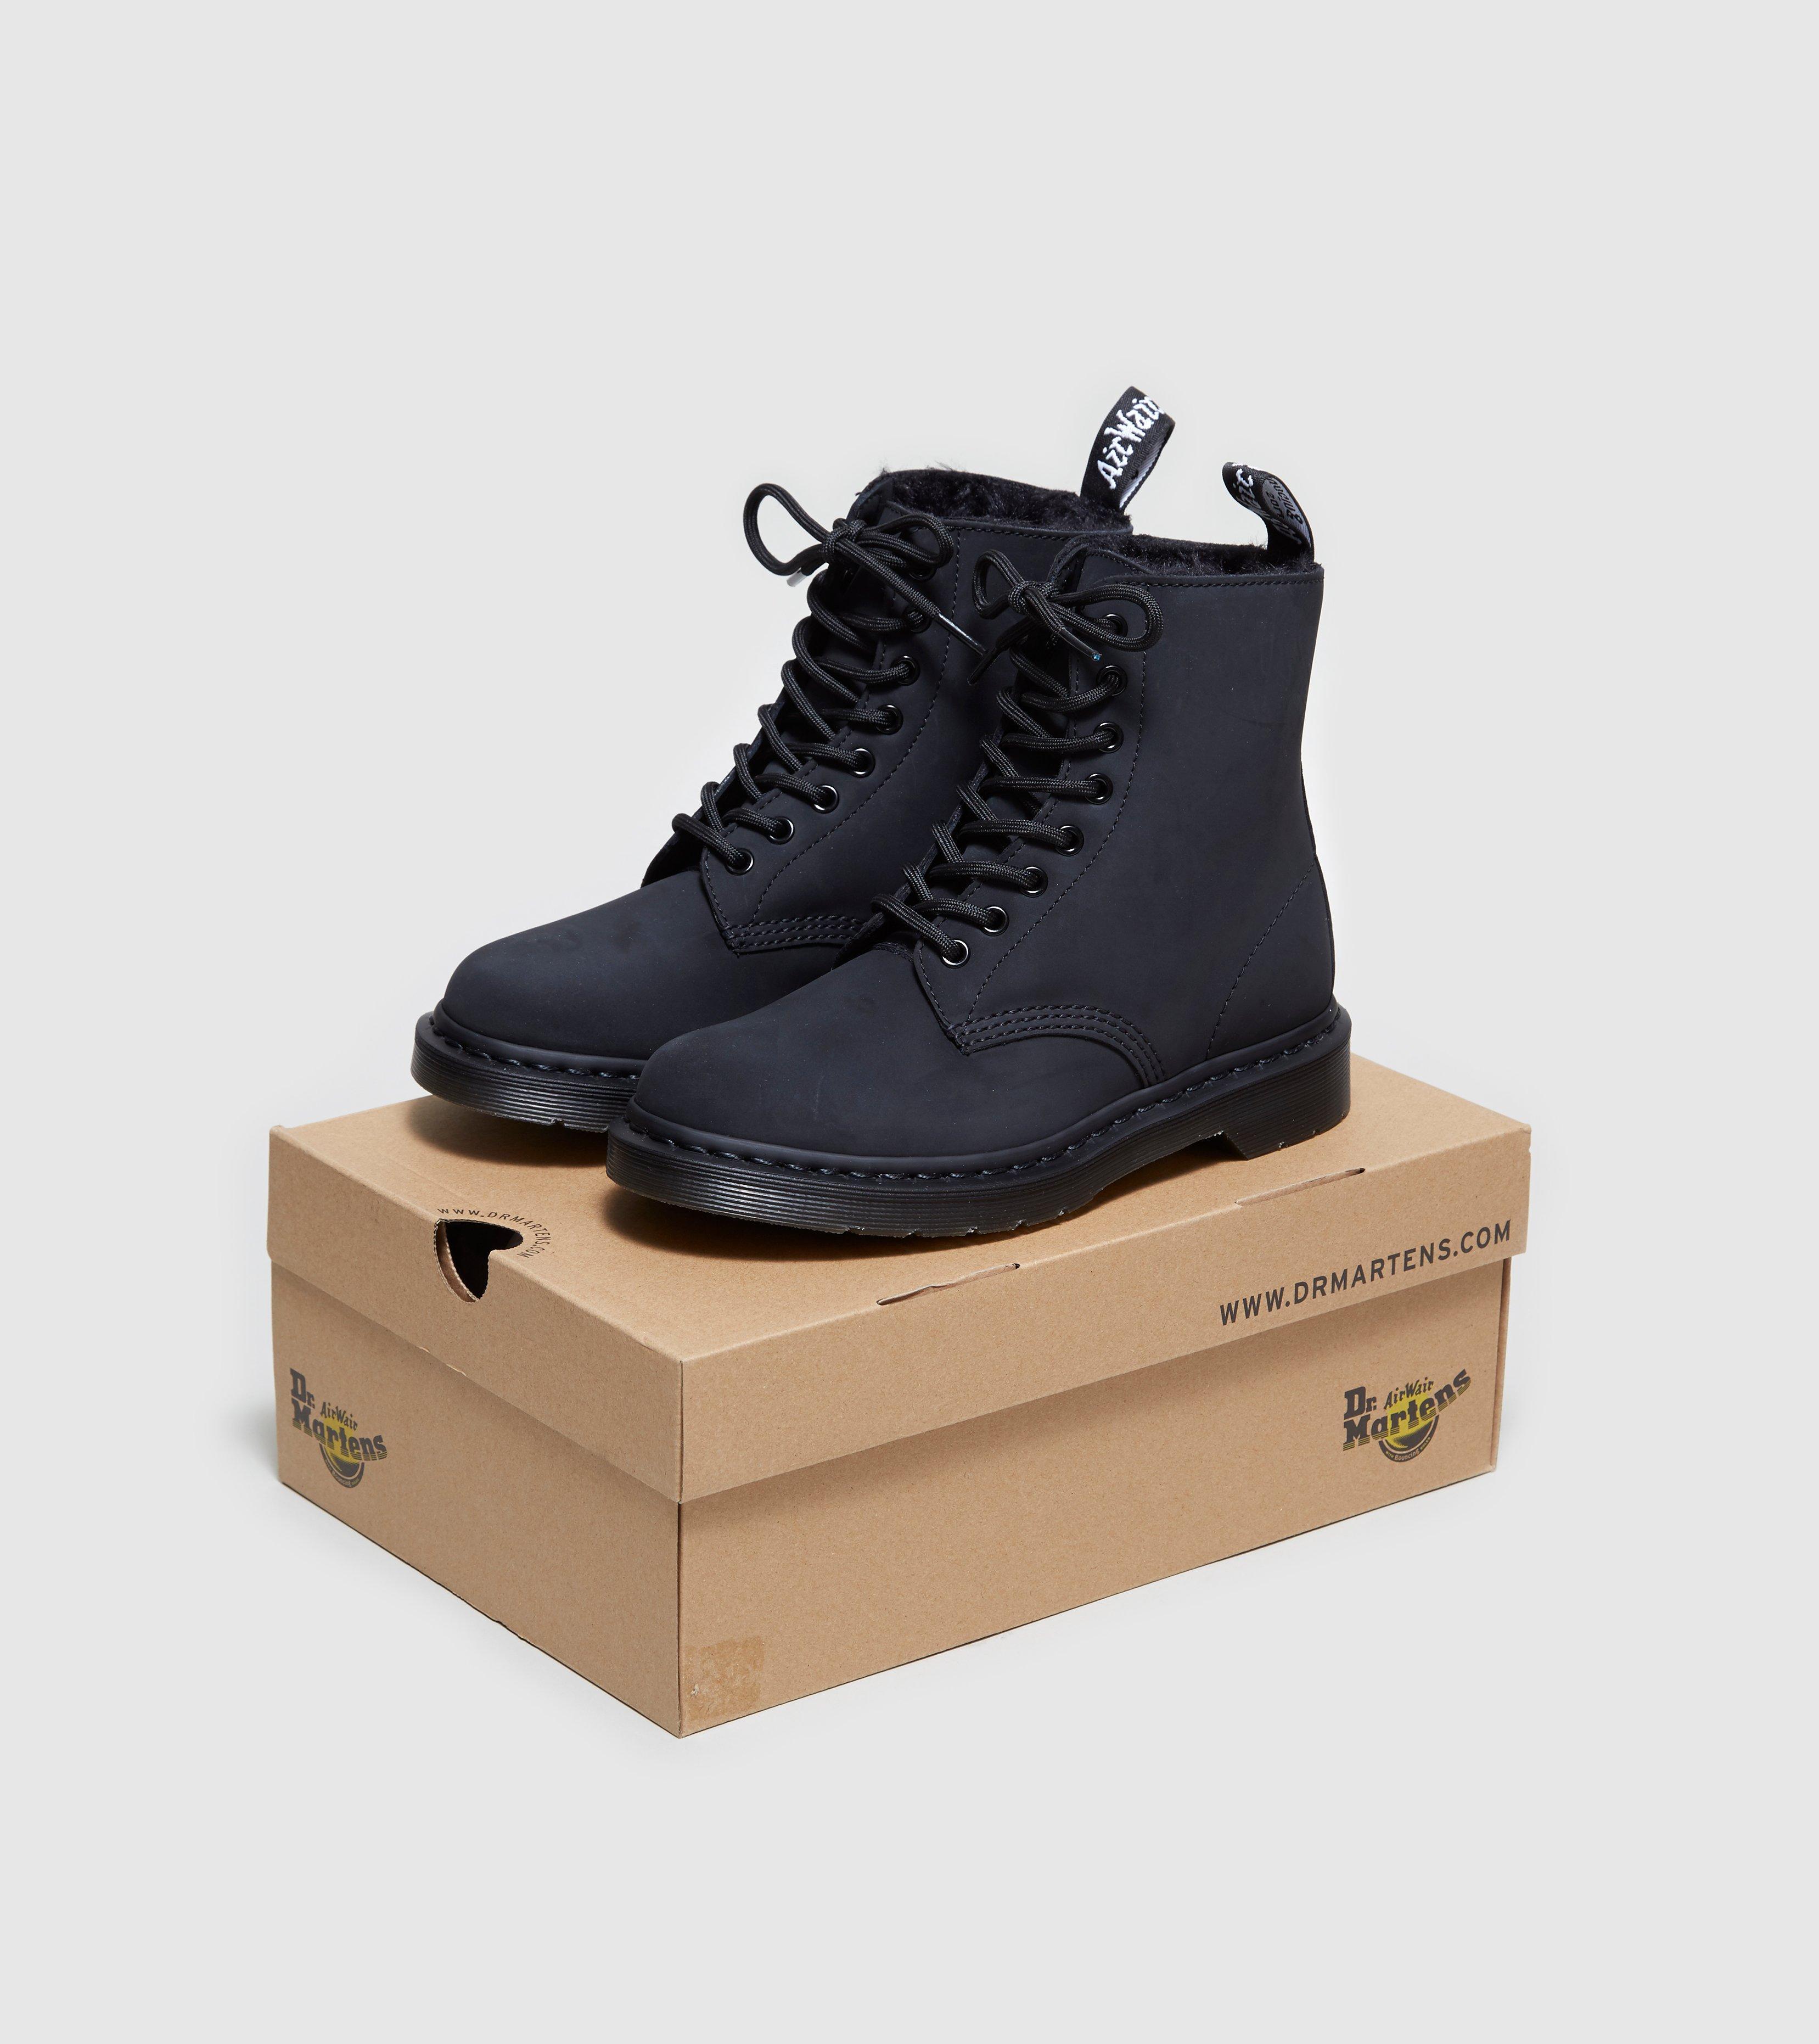 lyst dr martens pascal 8 eye boots in black. Black Bedroom Furniture Sets. Home Design Ideas